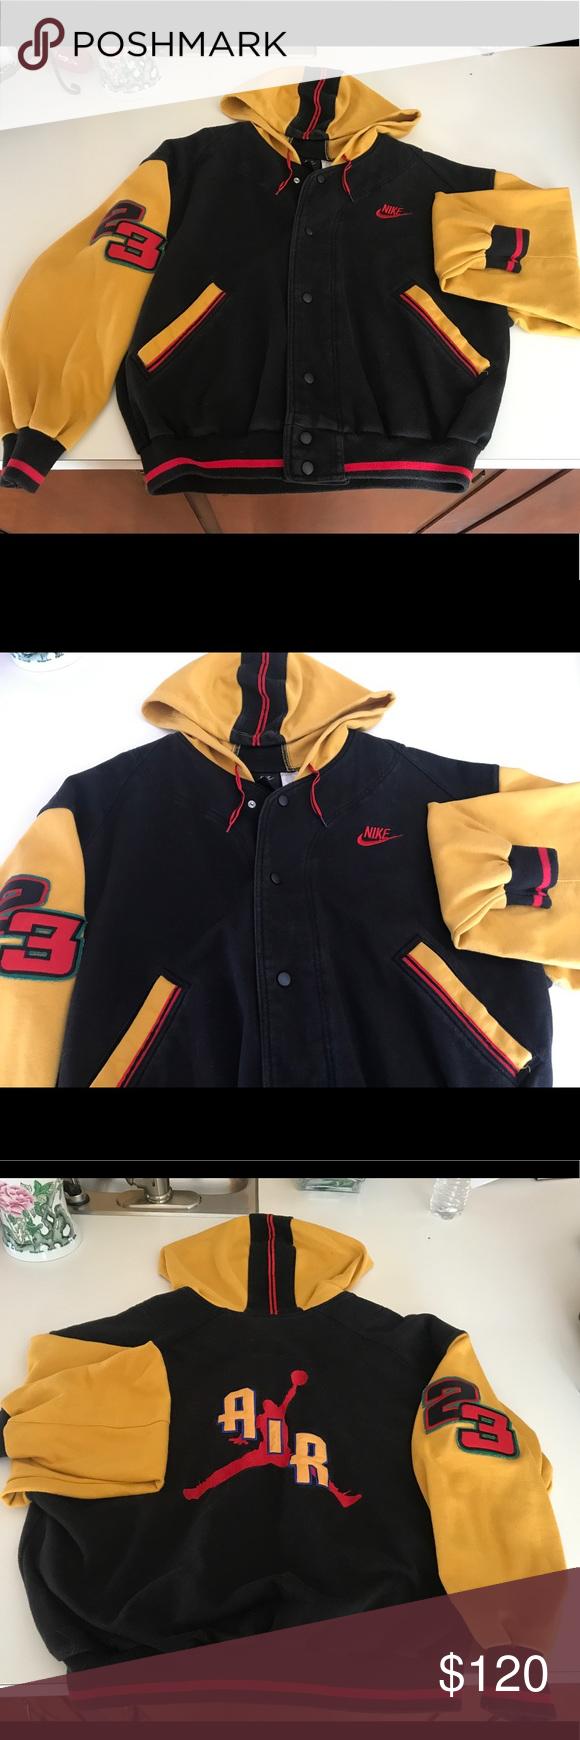 325b35e7f6b Authentic Jordan Nike jacket Vintage Nike Michael Air Jordan 23 Varsity  jacket Nike Jackets & Coats Bomber & Varsity